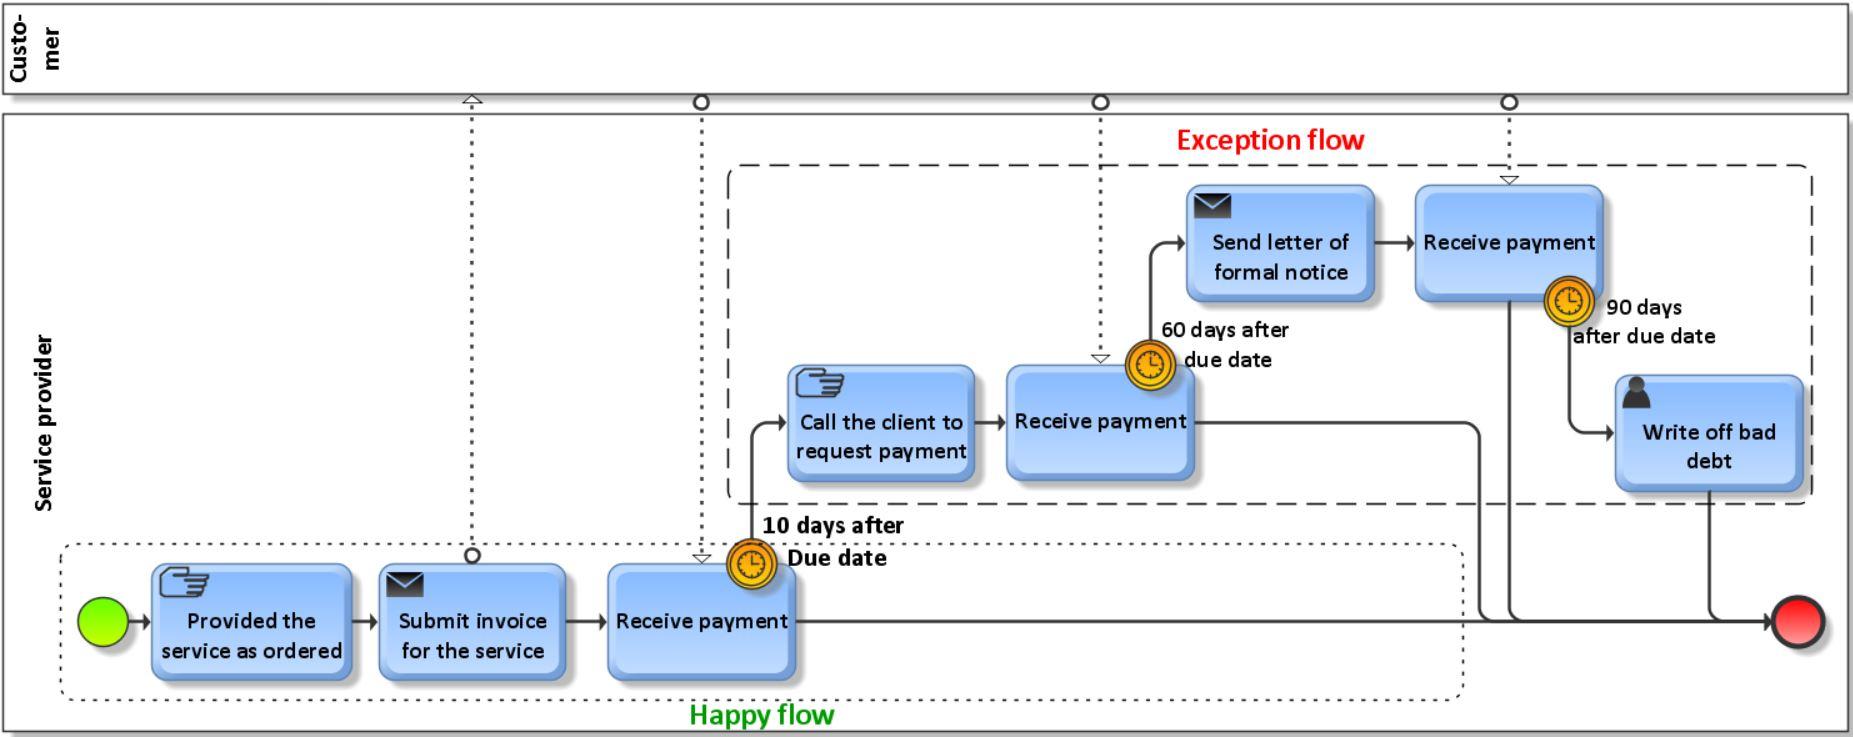 Happy versus Exception flow - 2